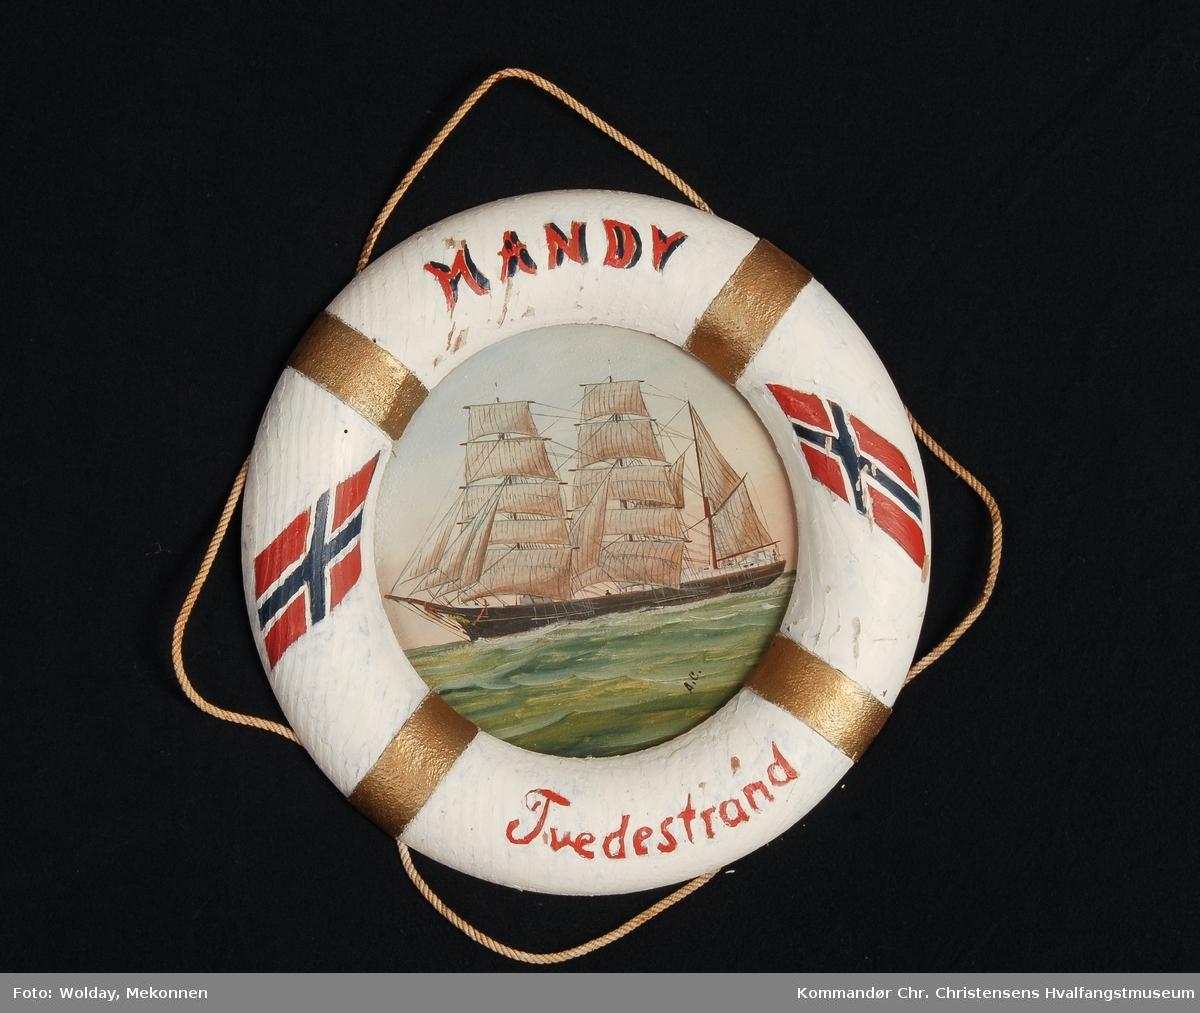 HANDY Nasjon: Norsk Type: Bark Byggeår: 1890 Byggested: Salterød, Arendal, Norge Endelig skjebne: Solgt til Frankrike 1907, forandret til ST. JAQUES